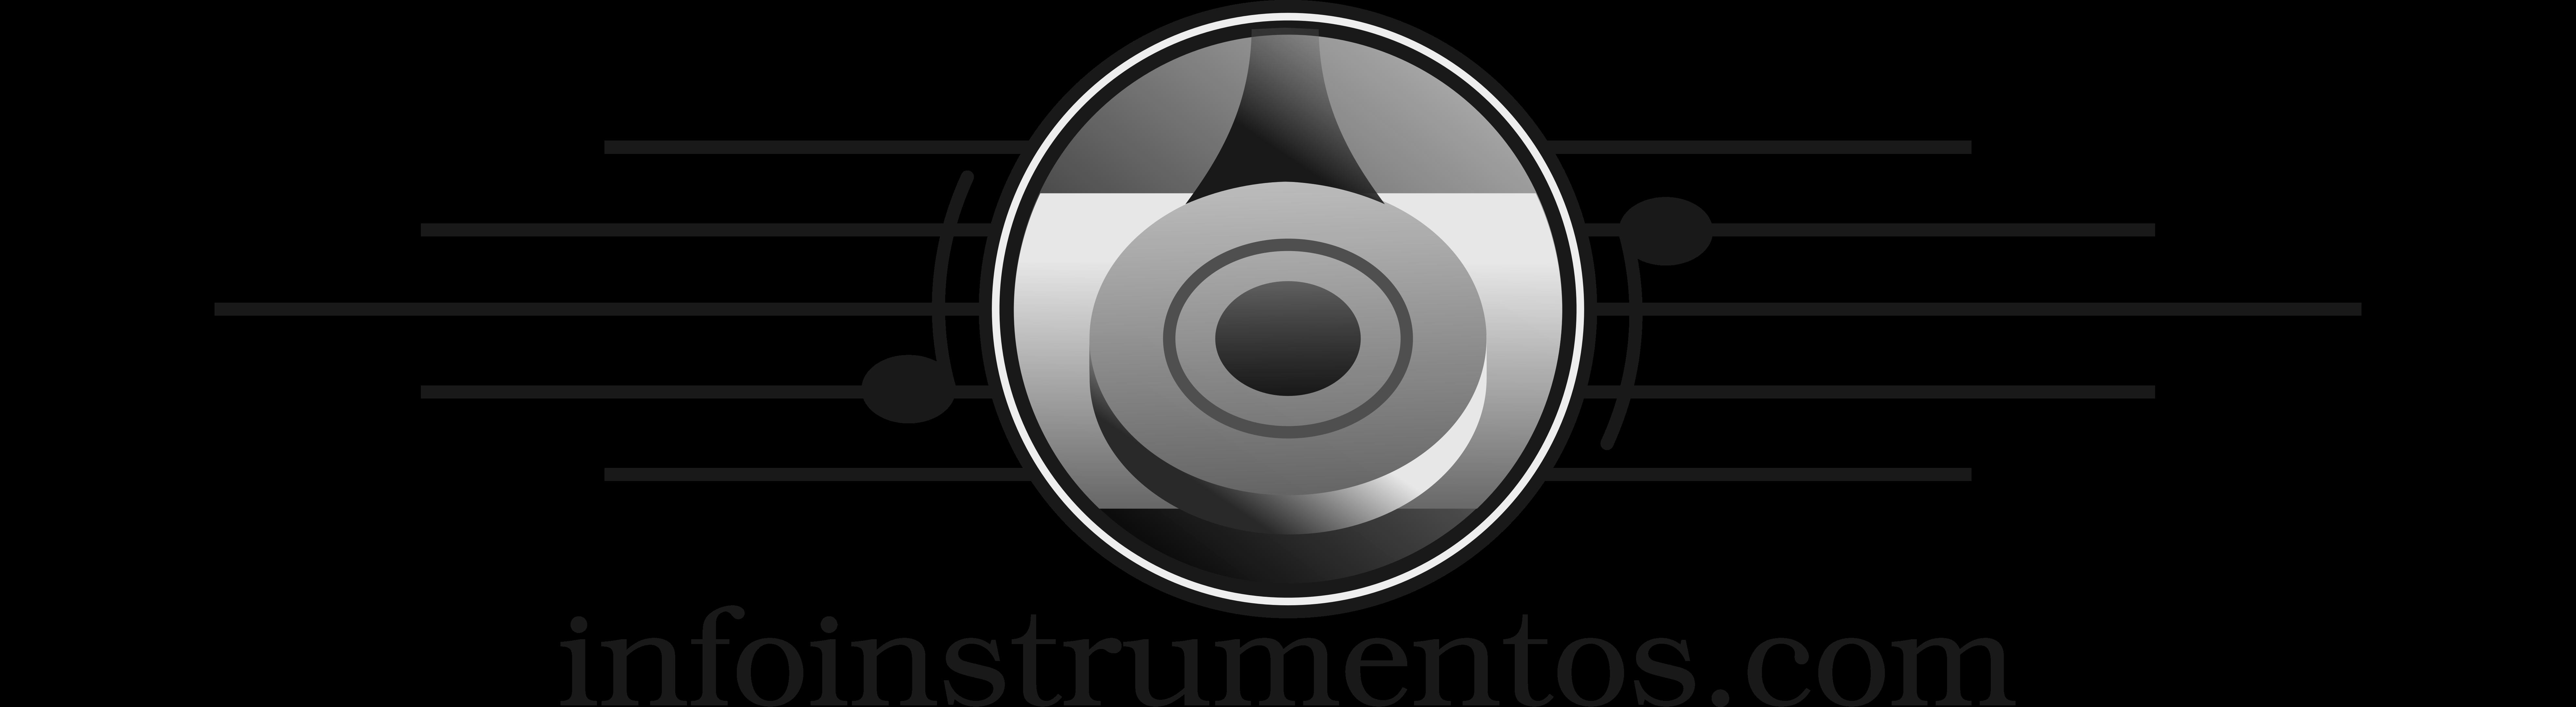 Correa dentada rectangular elatech/® isynctm 25/at5//420/N/úmero de dientes 84/longitud total 420/mm Sit elatech isync pu0420at5025